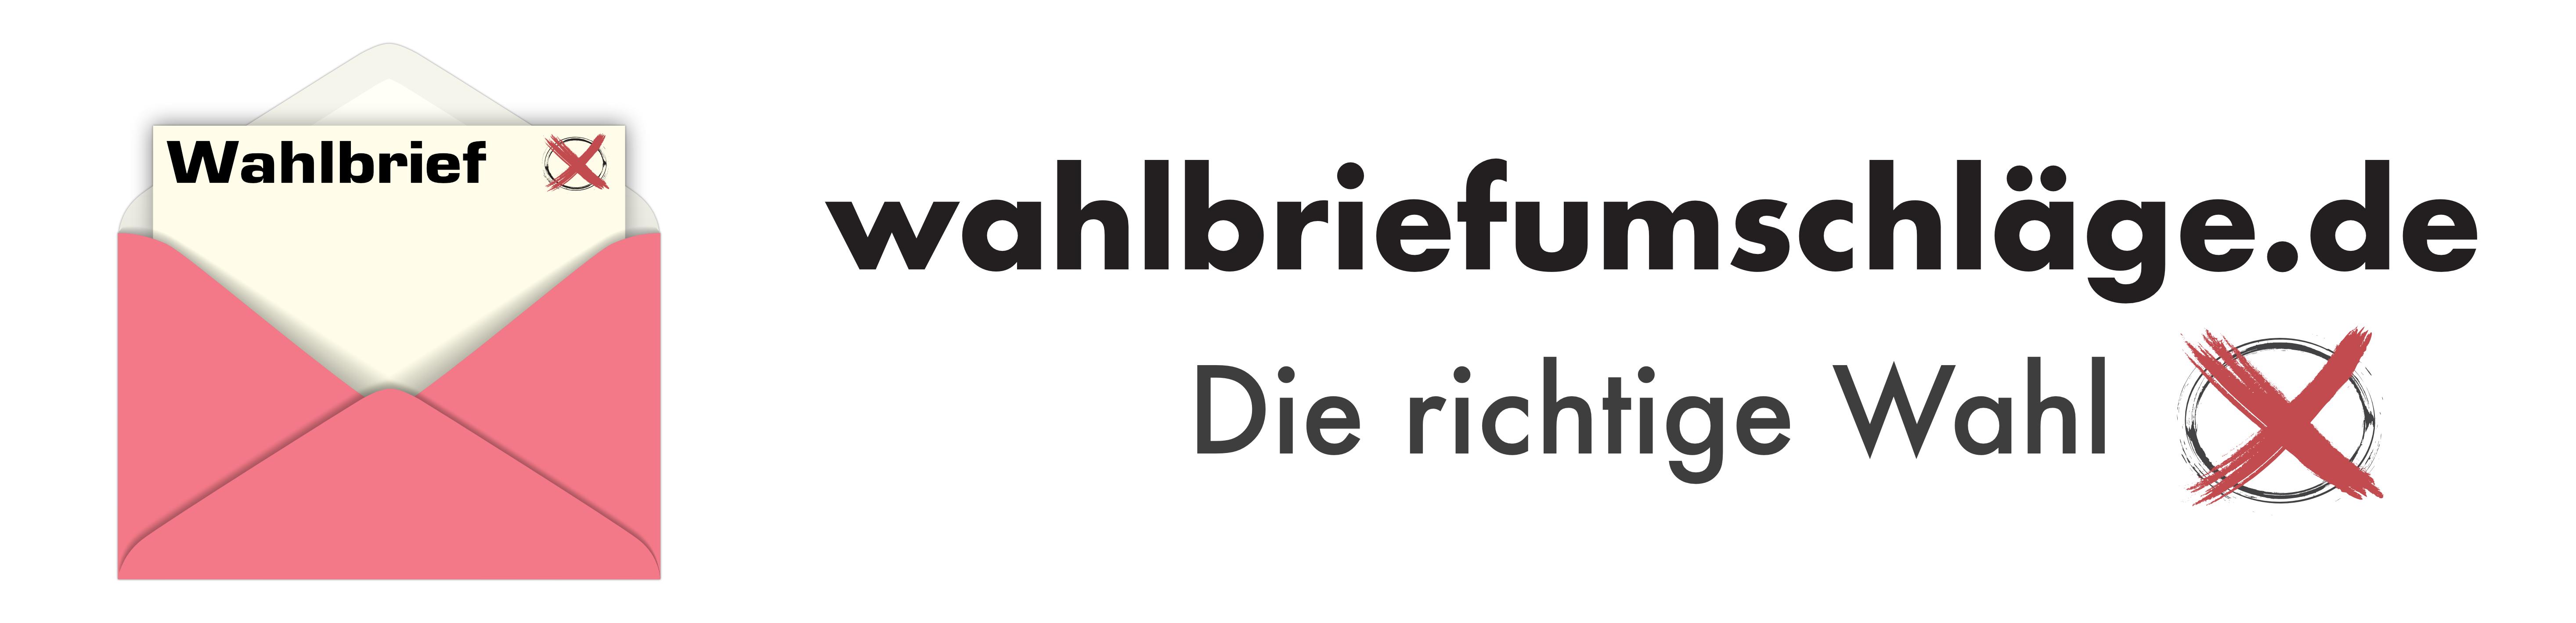 wahlbriefumschläge.de